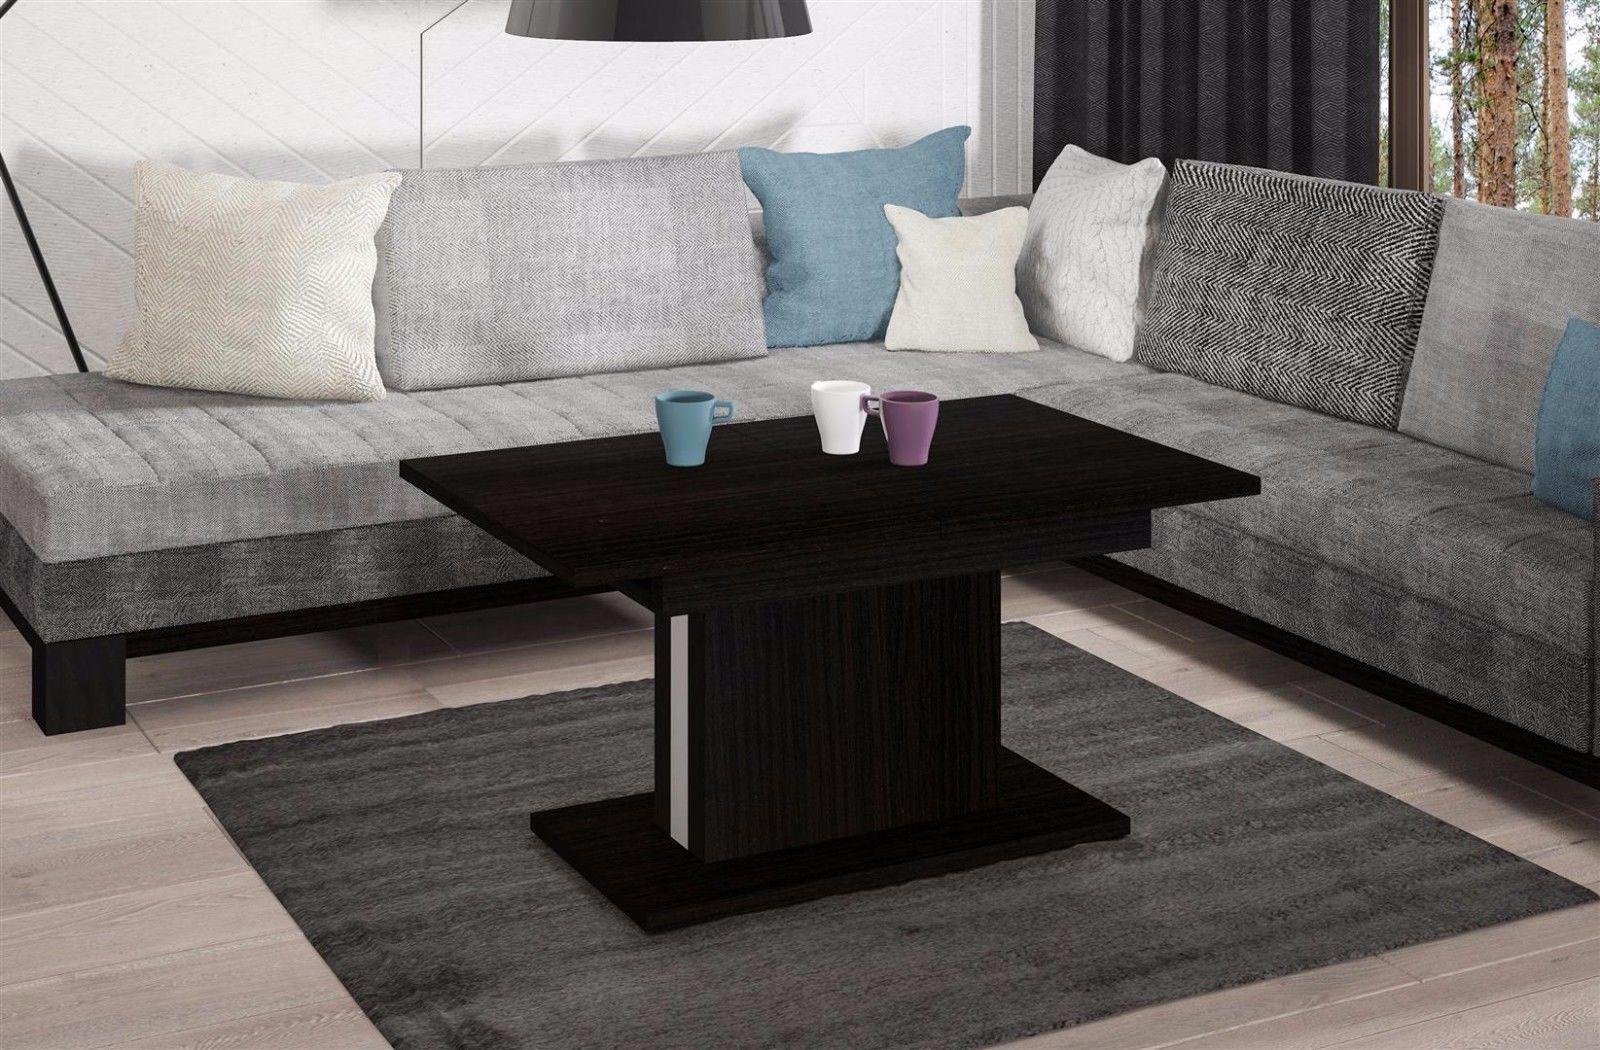 couchtisch design modern latest full size of carson couchtisch mid century modern coffee. Black Bedroom Furniture Sets. Home Design Ideas